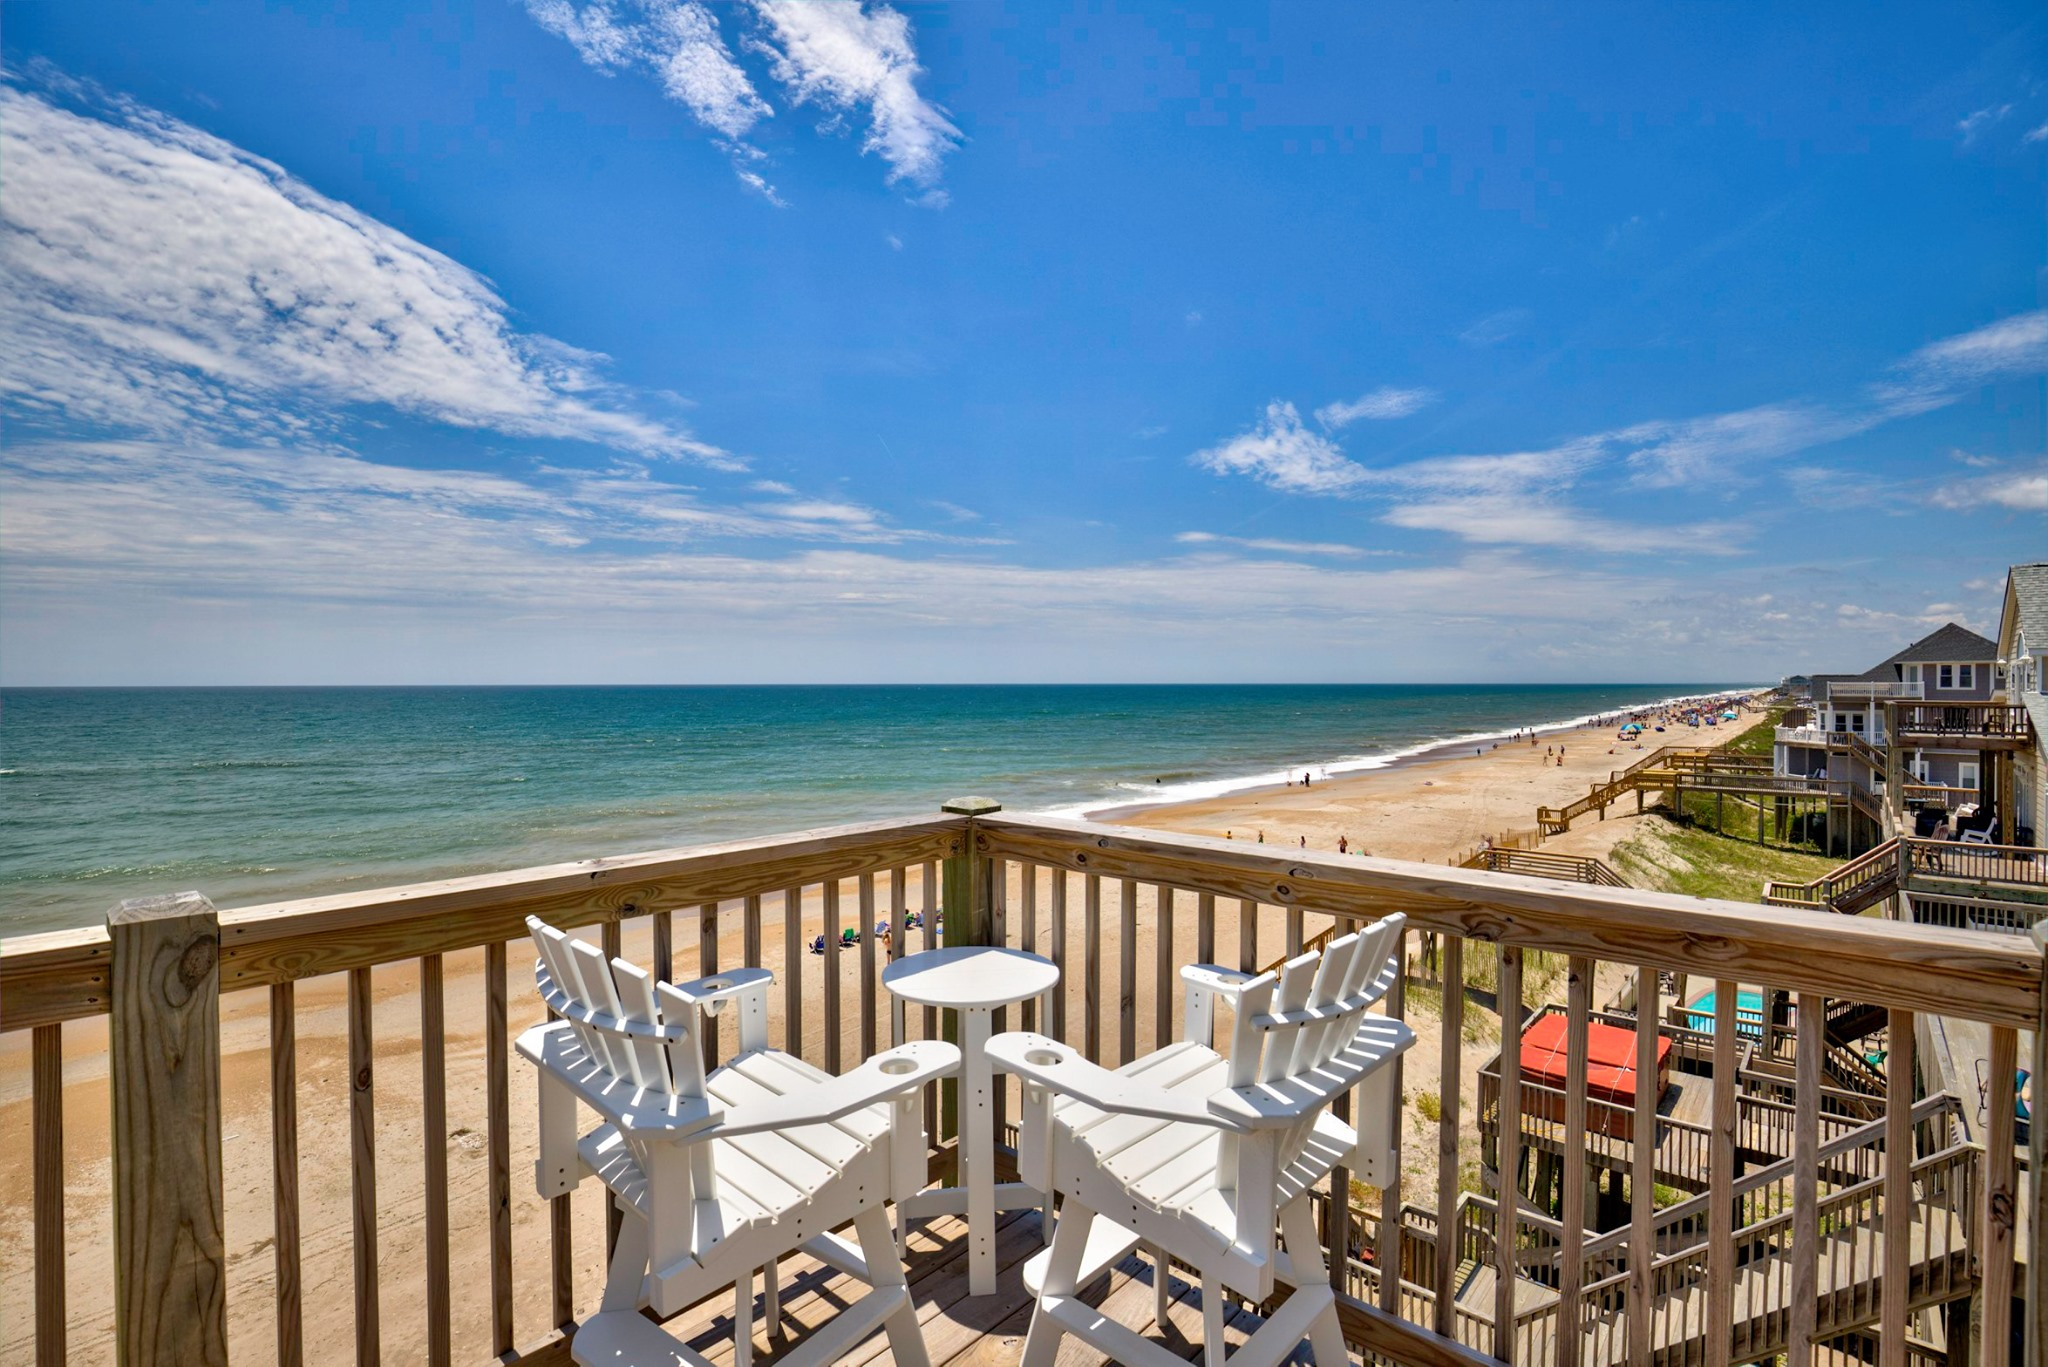 Treasure Realty Vacation Rental Accommodations on Topsail Island in North Topsail Beach and Surf City North Carolina